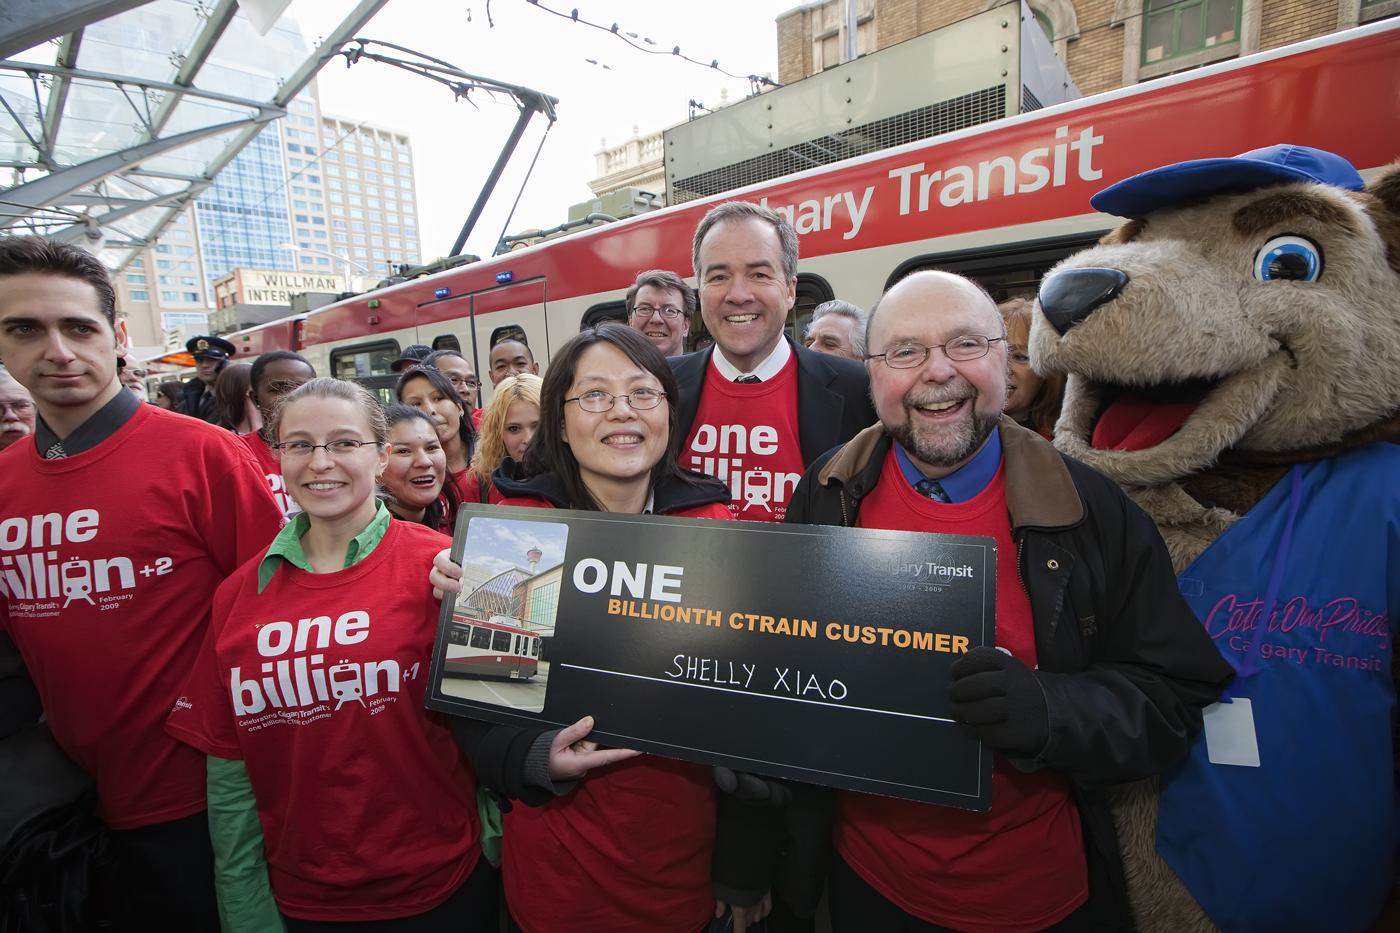 One billionth CTrain Customer